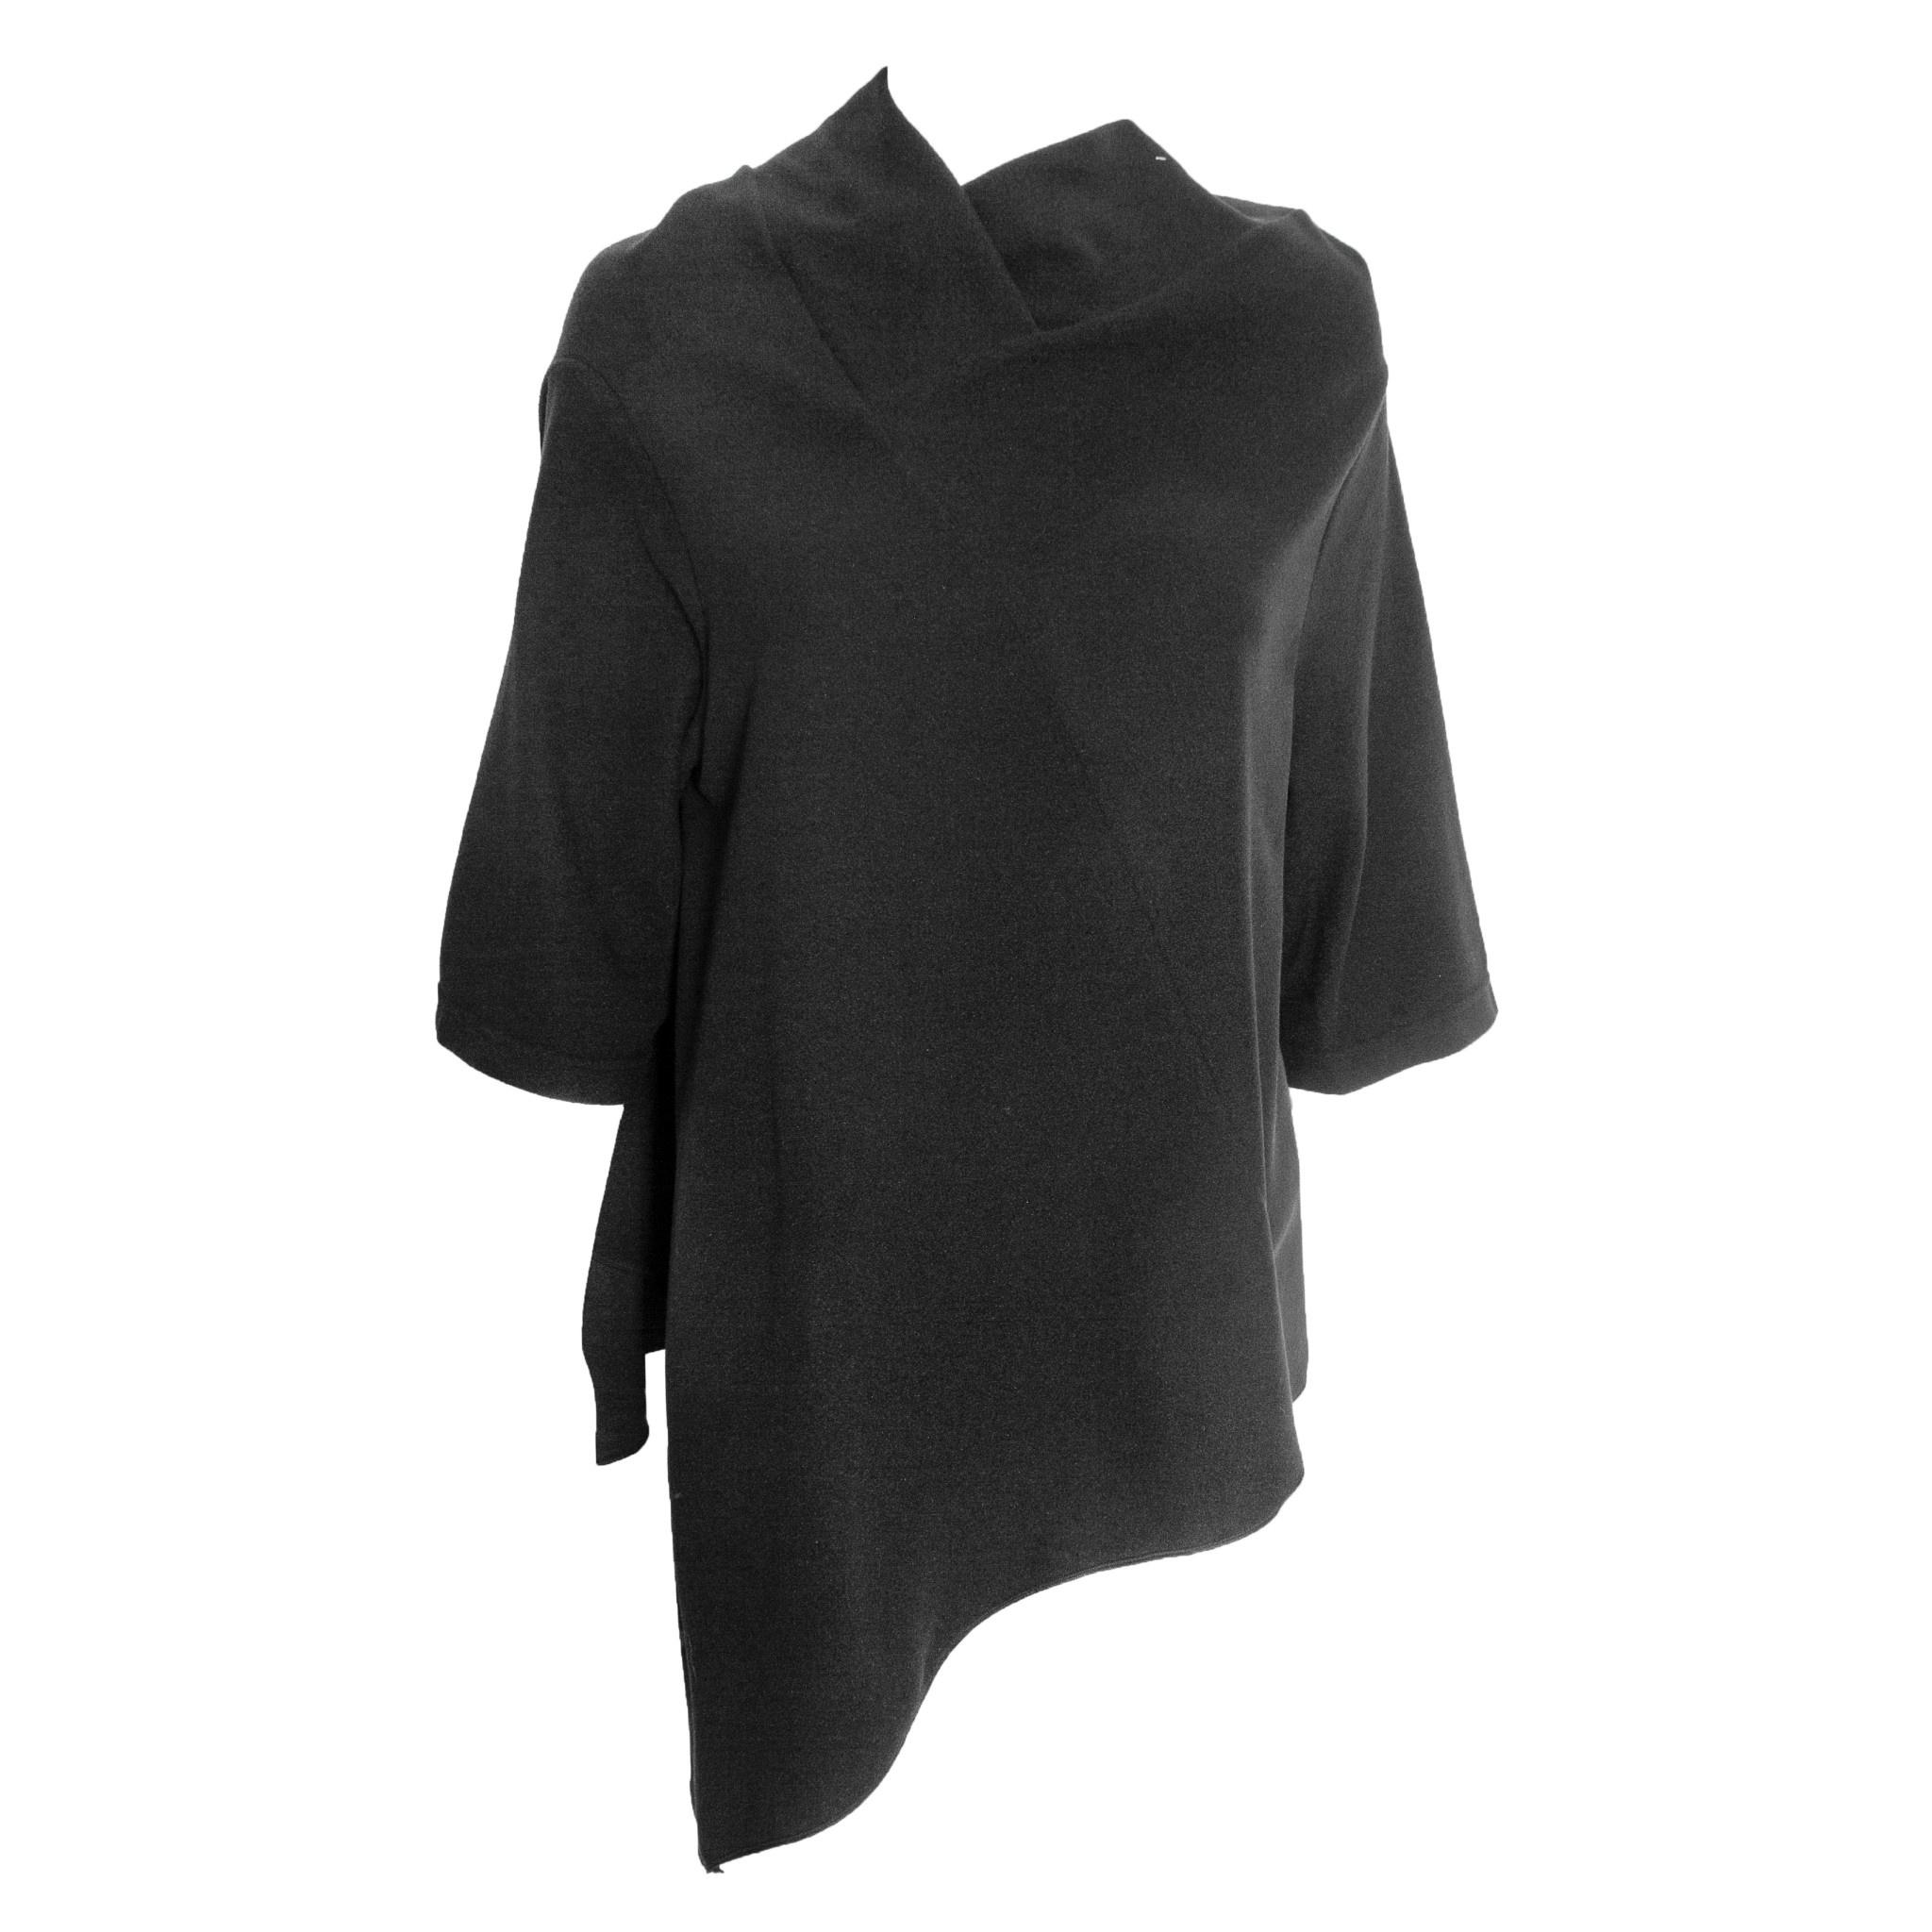 Xenia Xenia Buce Shirt - Black/Red